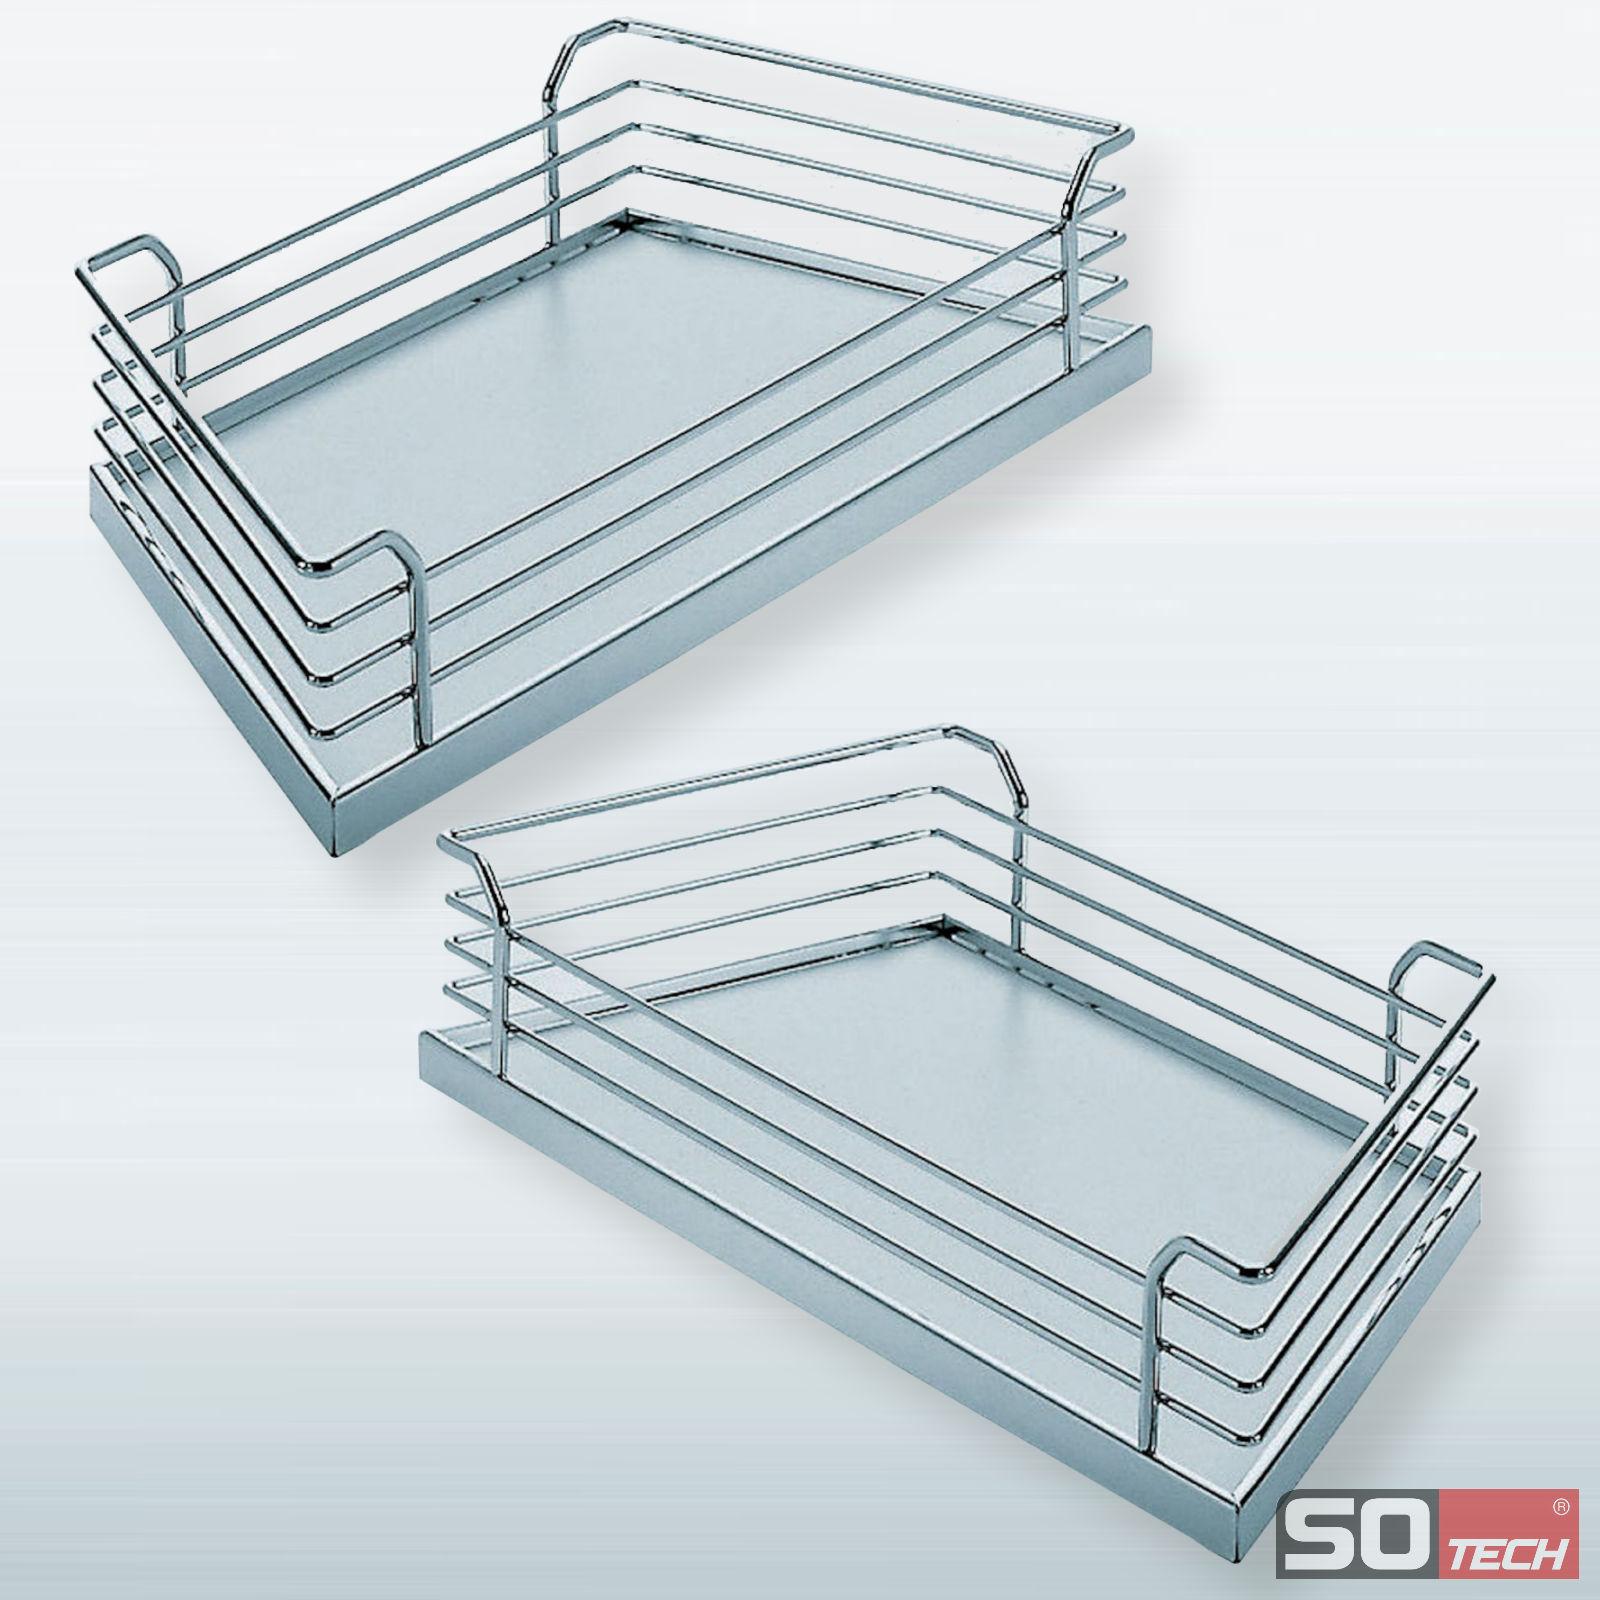 kesseb hmer senso klappenbeschlag hochfaltbeschlag hochfaltklappe beschlag ebay. Black Bedroom Furniture Sets. Home Design Ideas